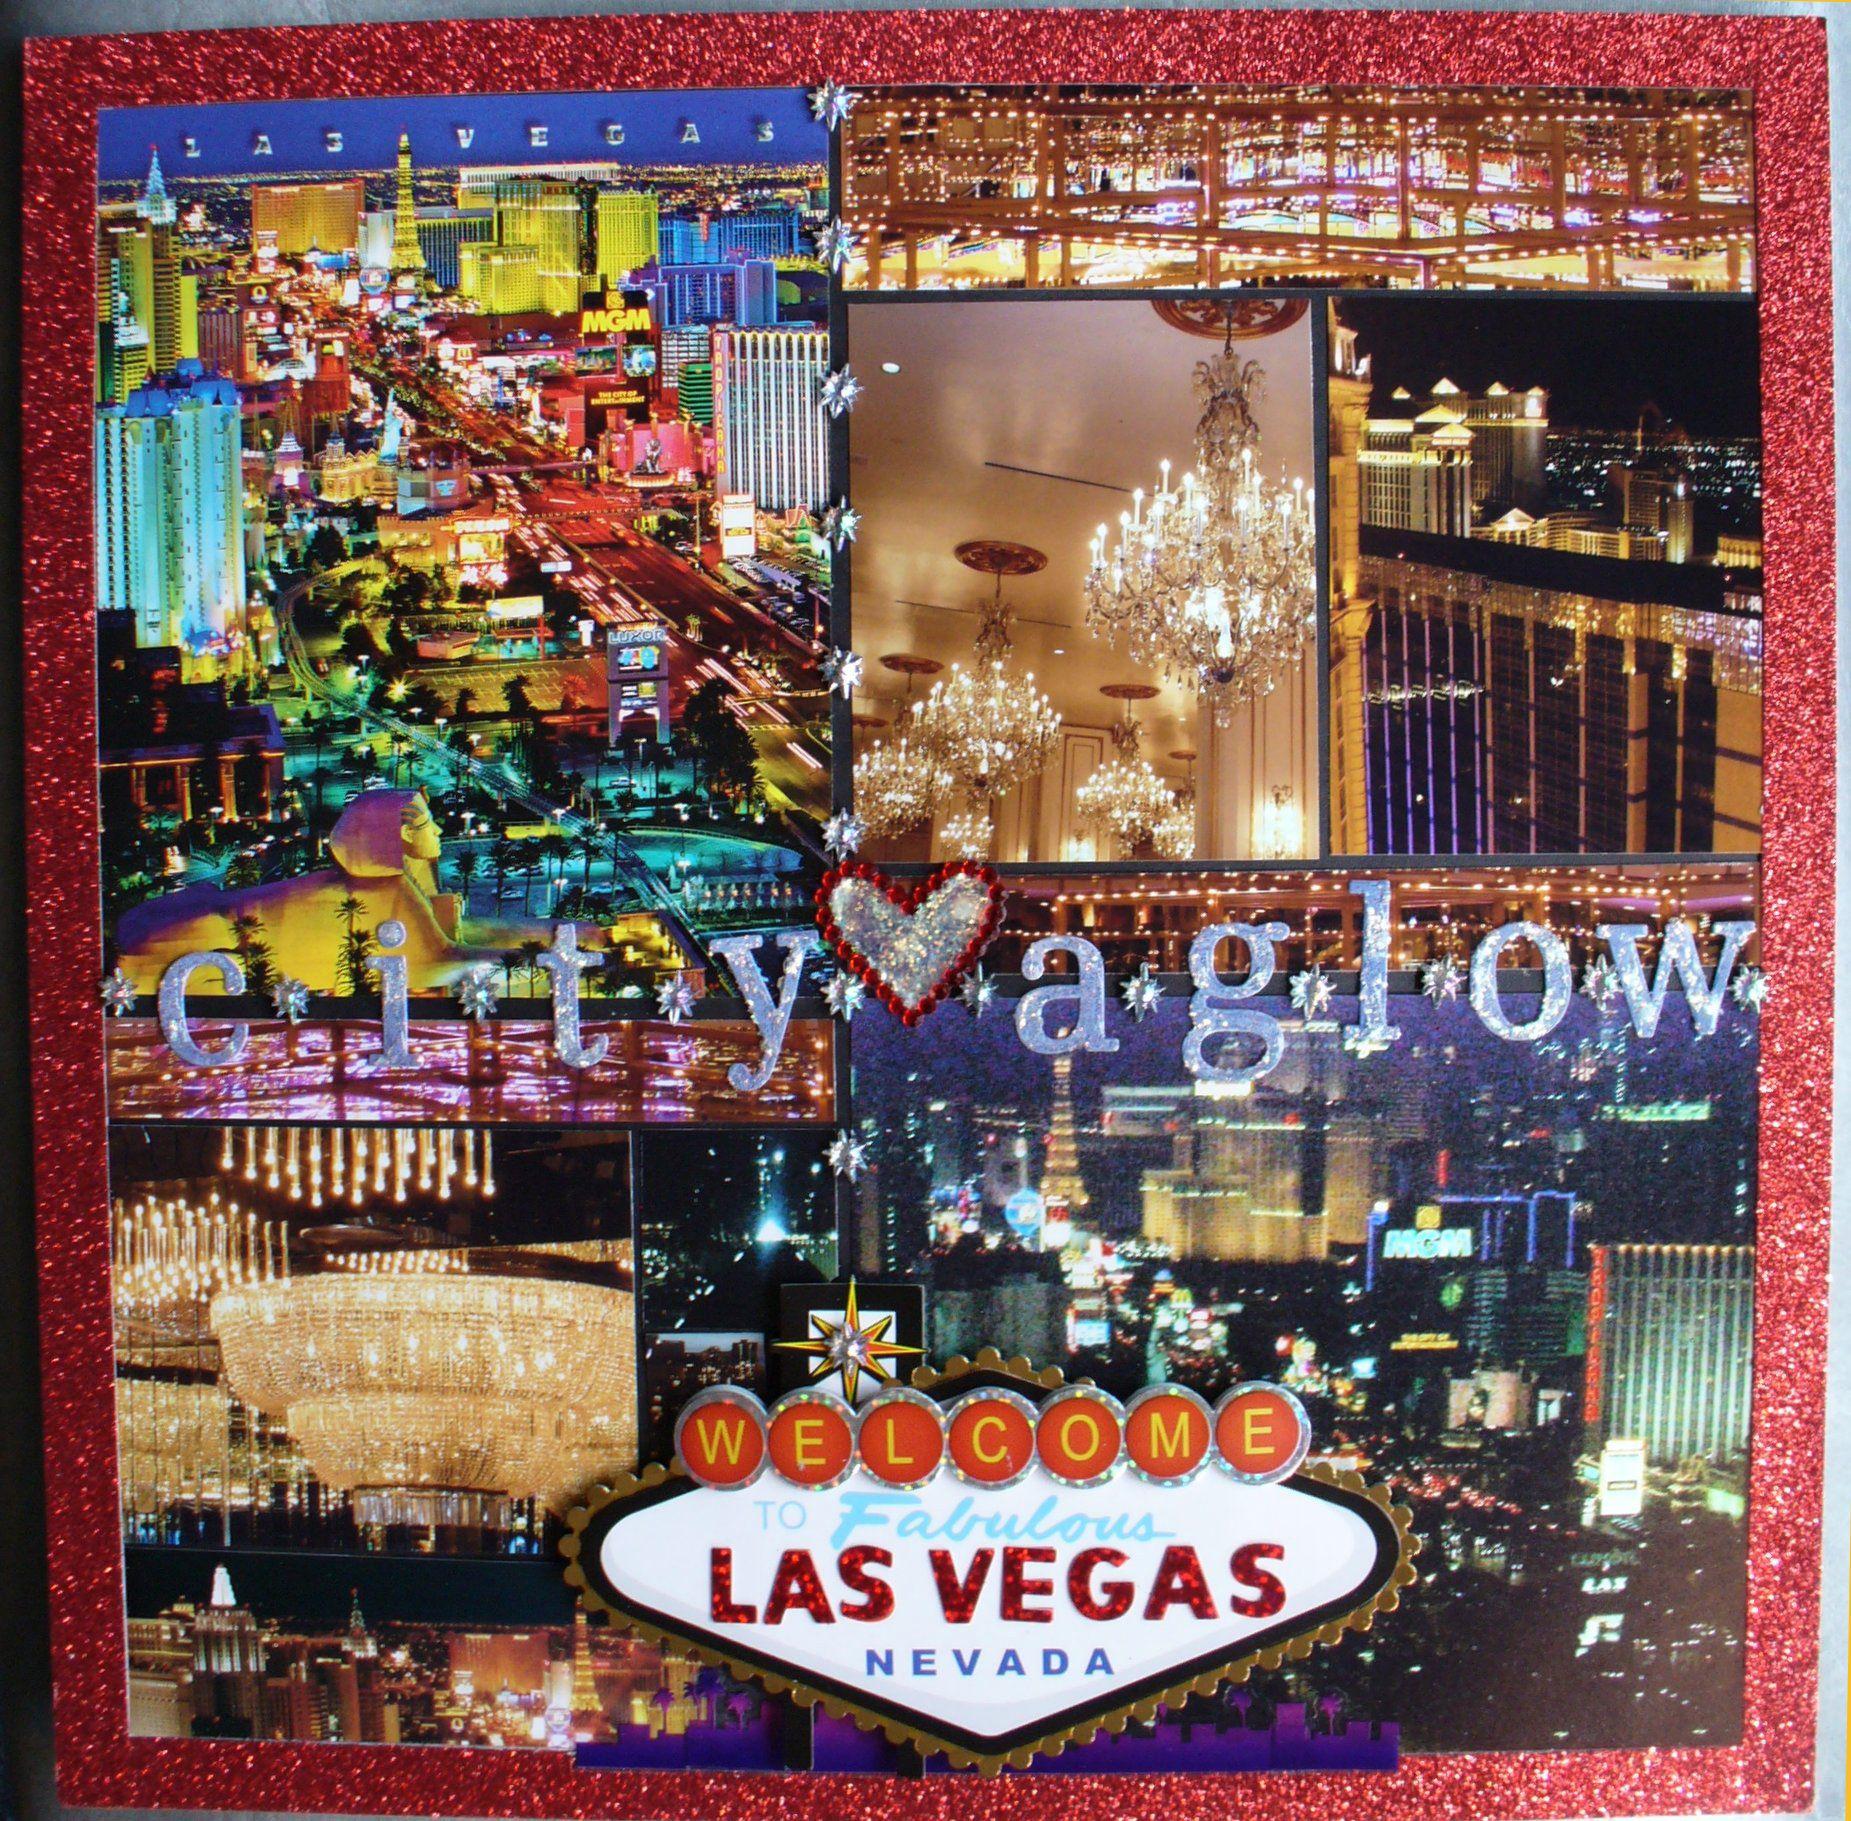 Scrapbook ideas las vegas -  Ver 1 000 Bilder Om Las Vegas Scrapbooking P Pinterestpapercraft Resor Och Sidlayouter Scrapbook